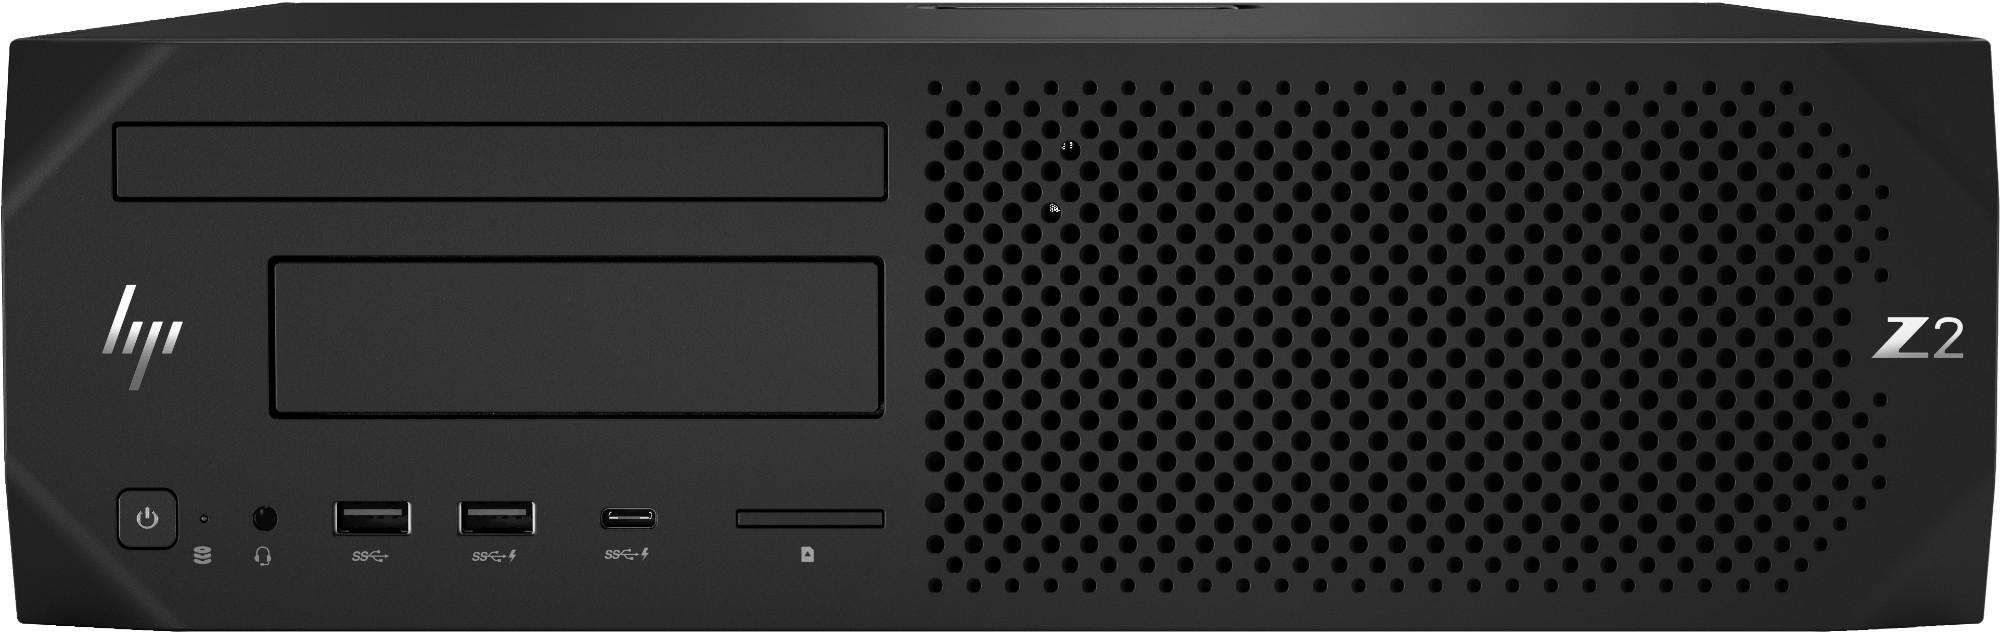 HP Z2 G4 8th gen Intel® Core™ i7 i7-8700 16 GB DDR4-SDRAM 256 GB SSD SFF Black Workstation Windows 10 Pro